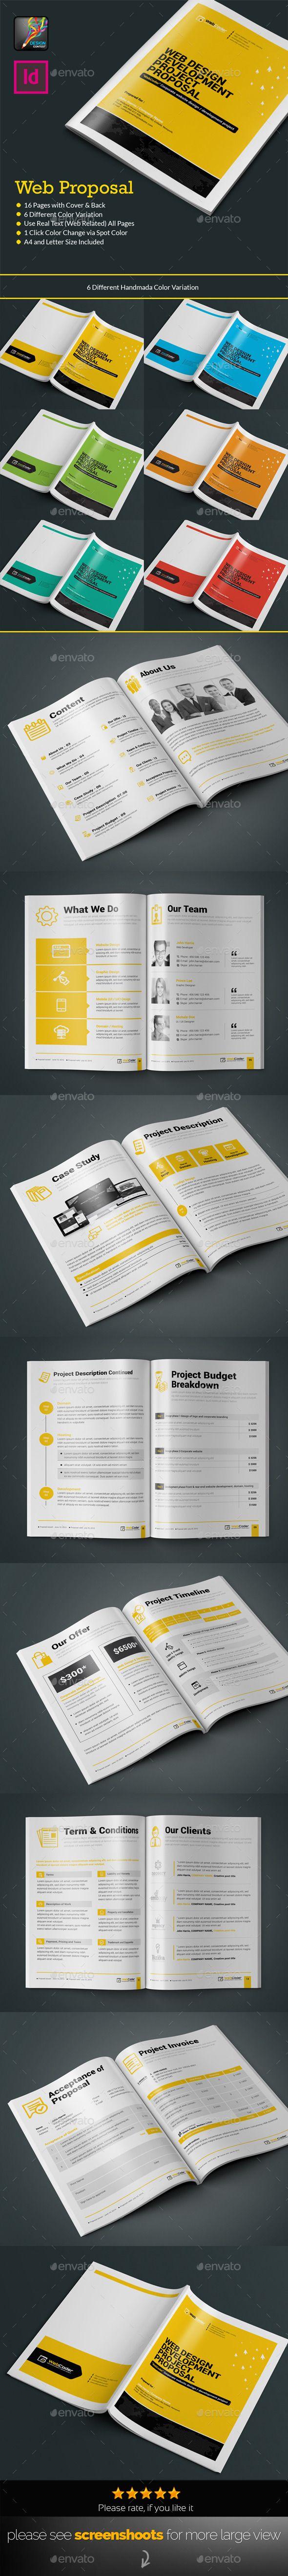 Web Proposal for Web Design & Development Agency Template #design Download: http://graphicriver.net/item/web-proposal-for-web-design-development-agency/12349424?ref=ksioks